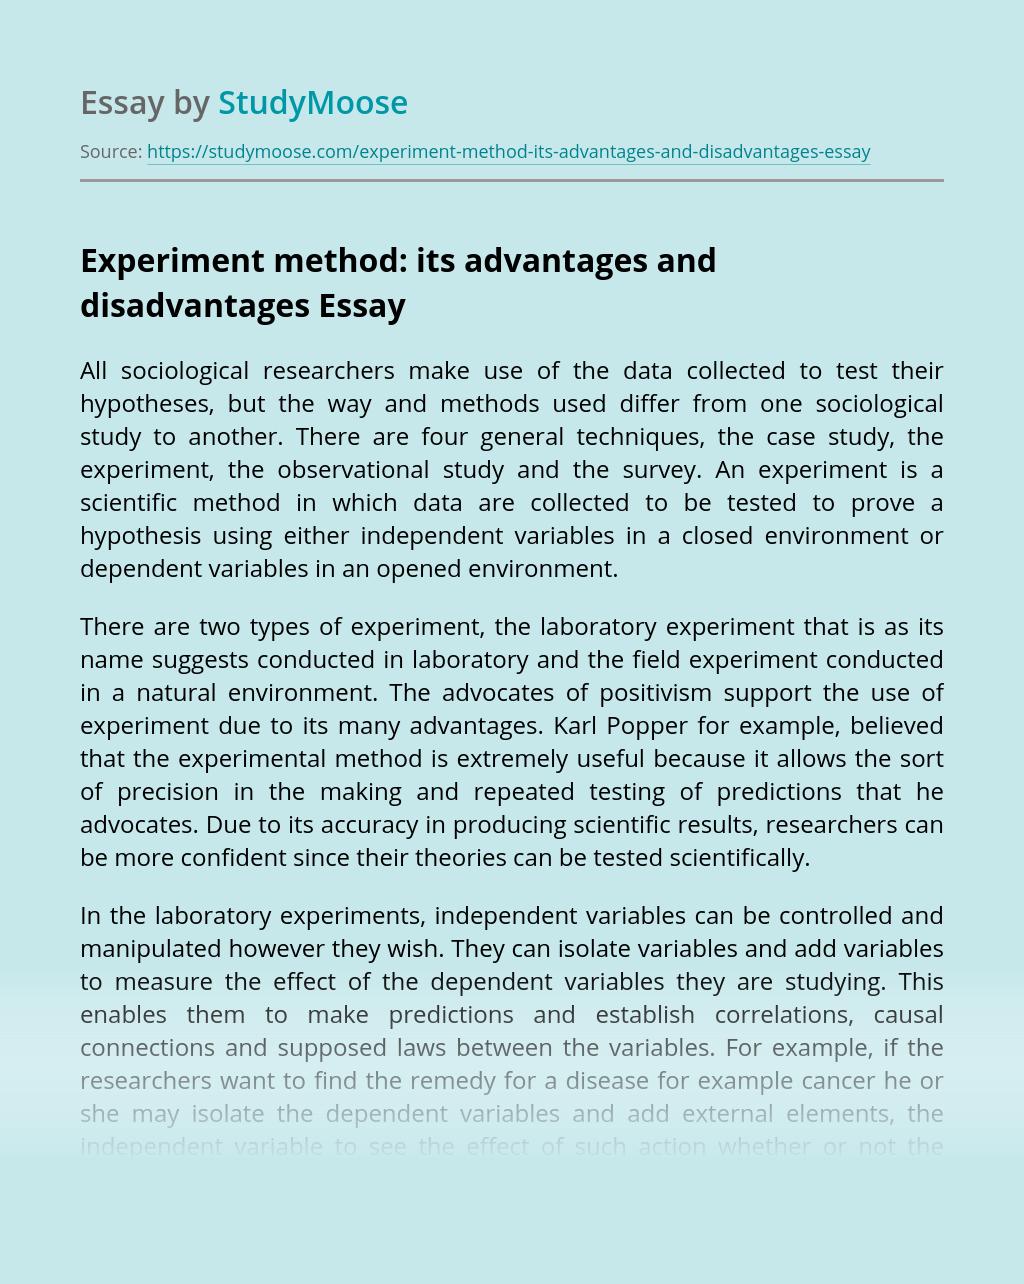 Experiment Method: Its Advantages and Disadvantages